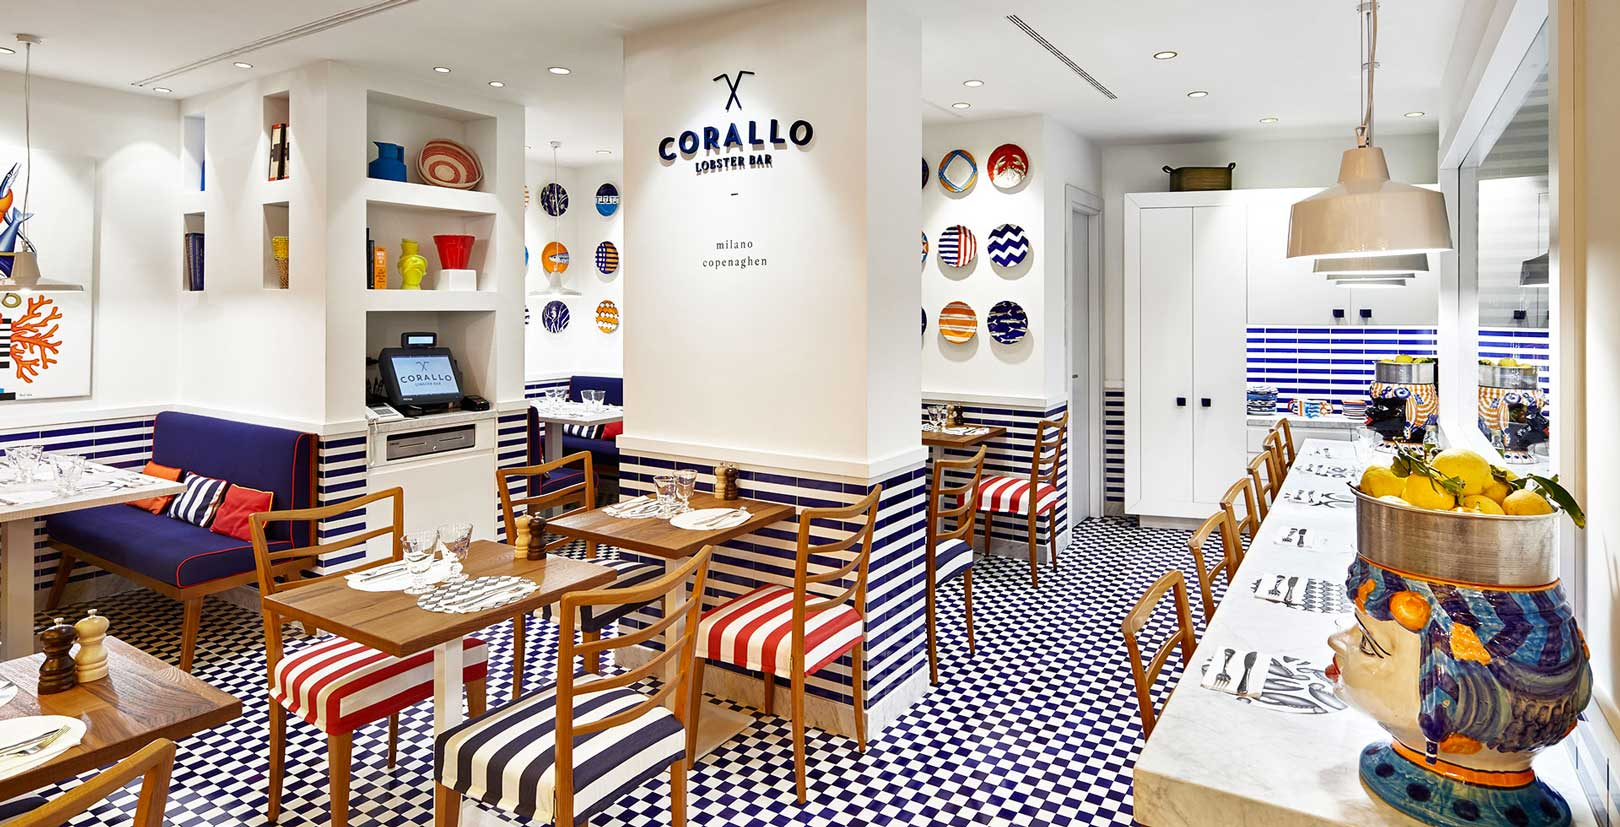 Corallo Lobster Bar